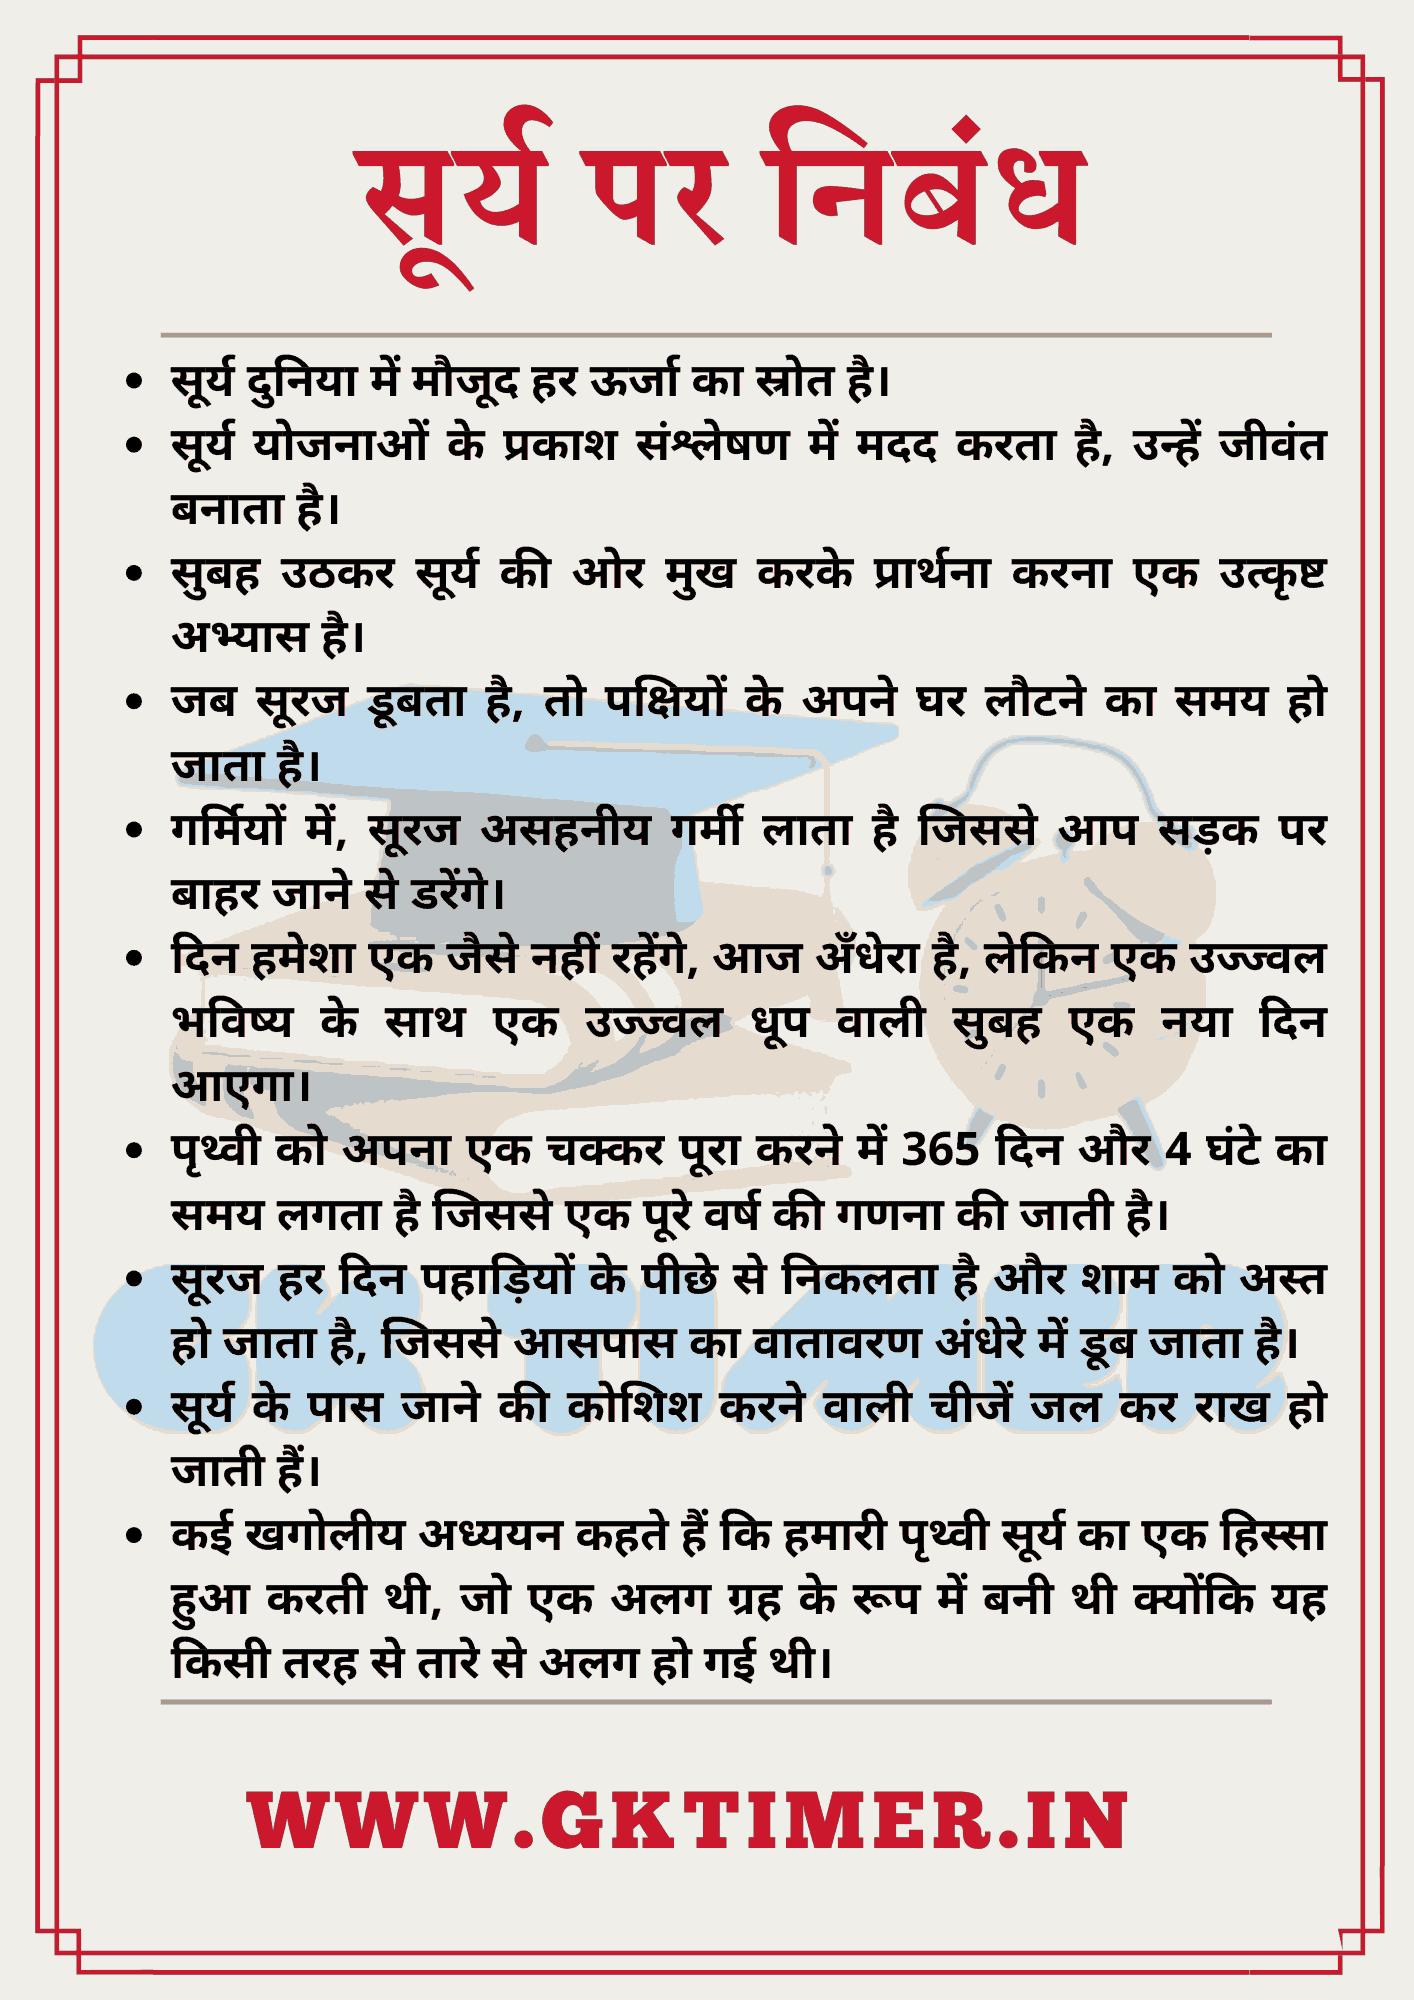 सूर्य पर निबन्ध   Essay on Sun in Hindi   10 Lines on Sun in Hindi